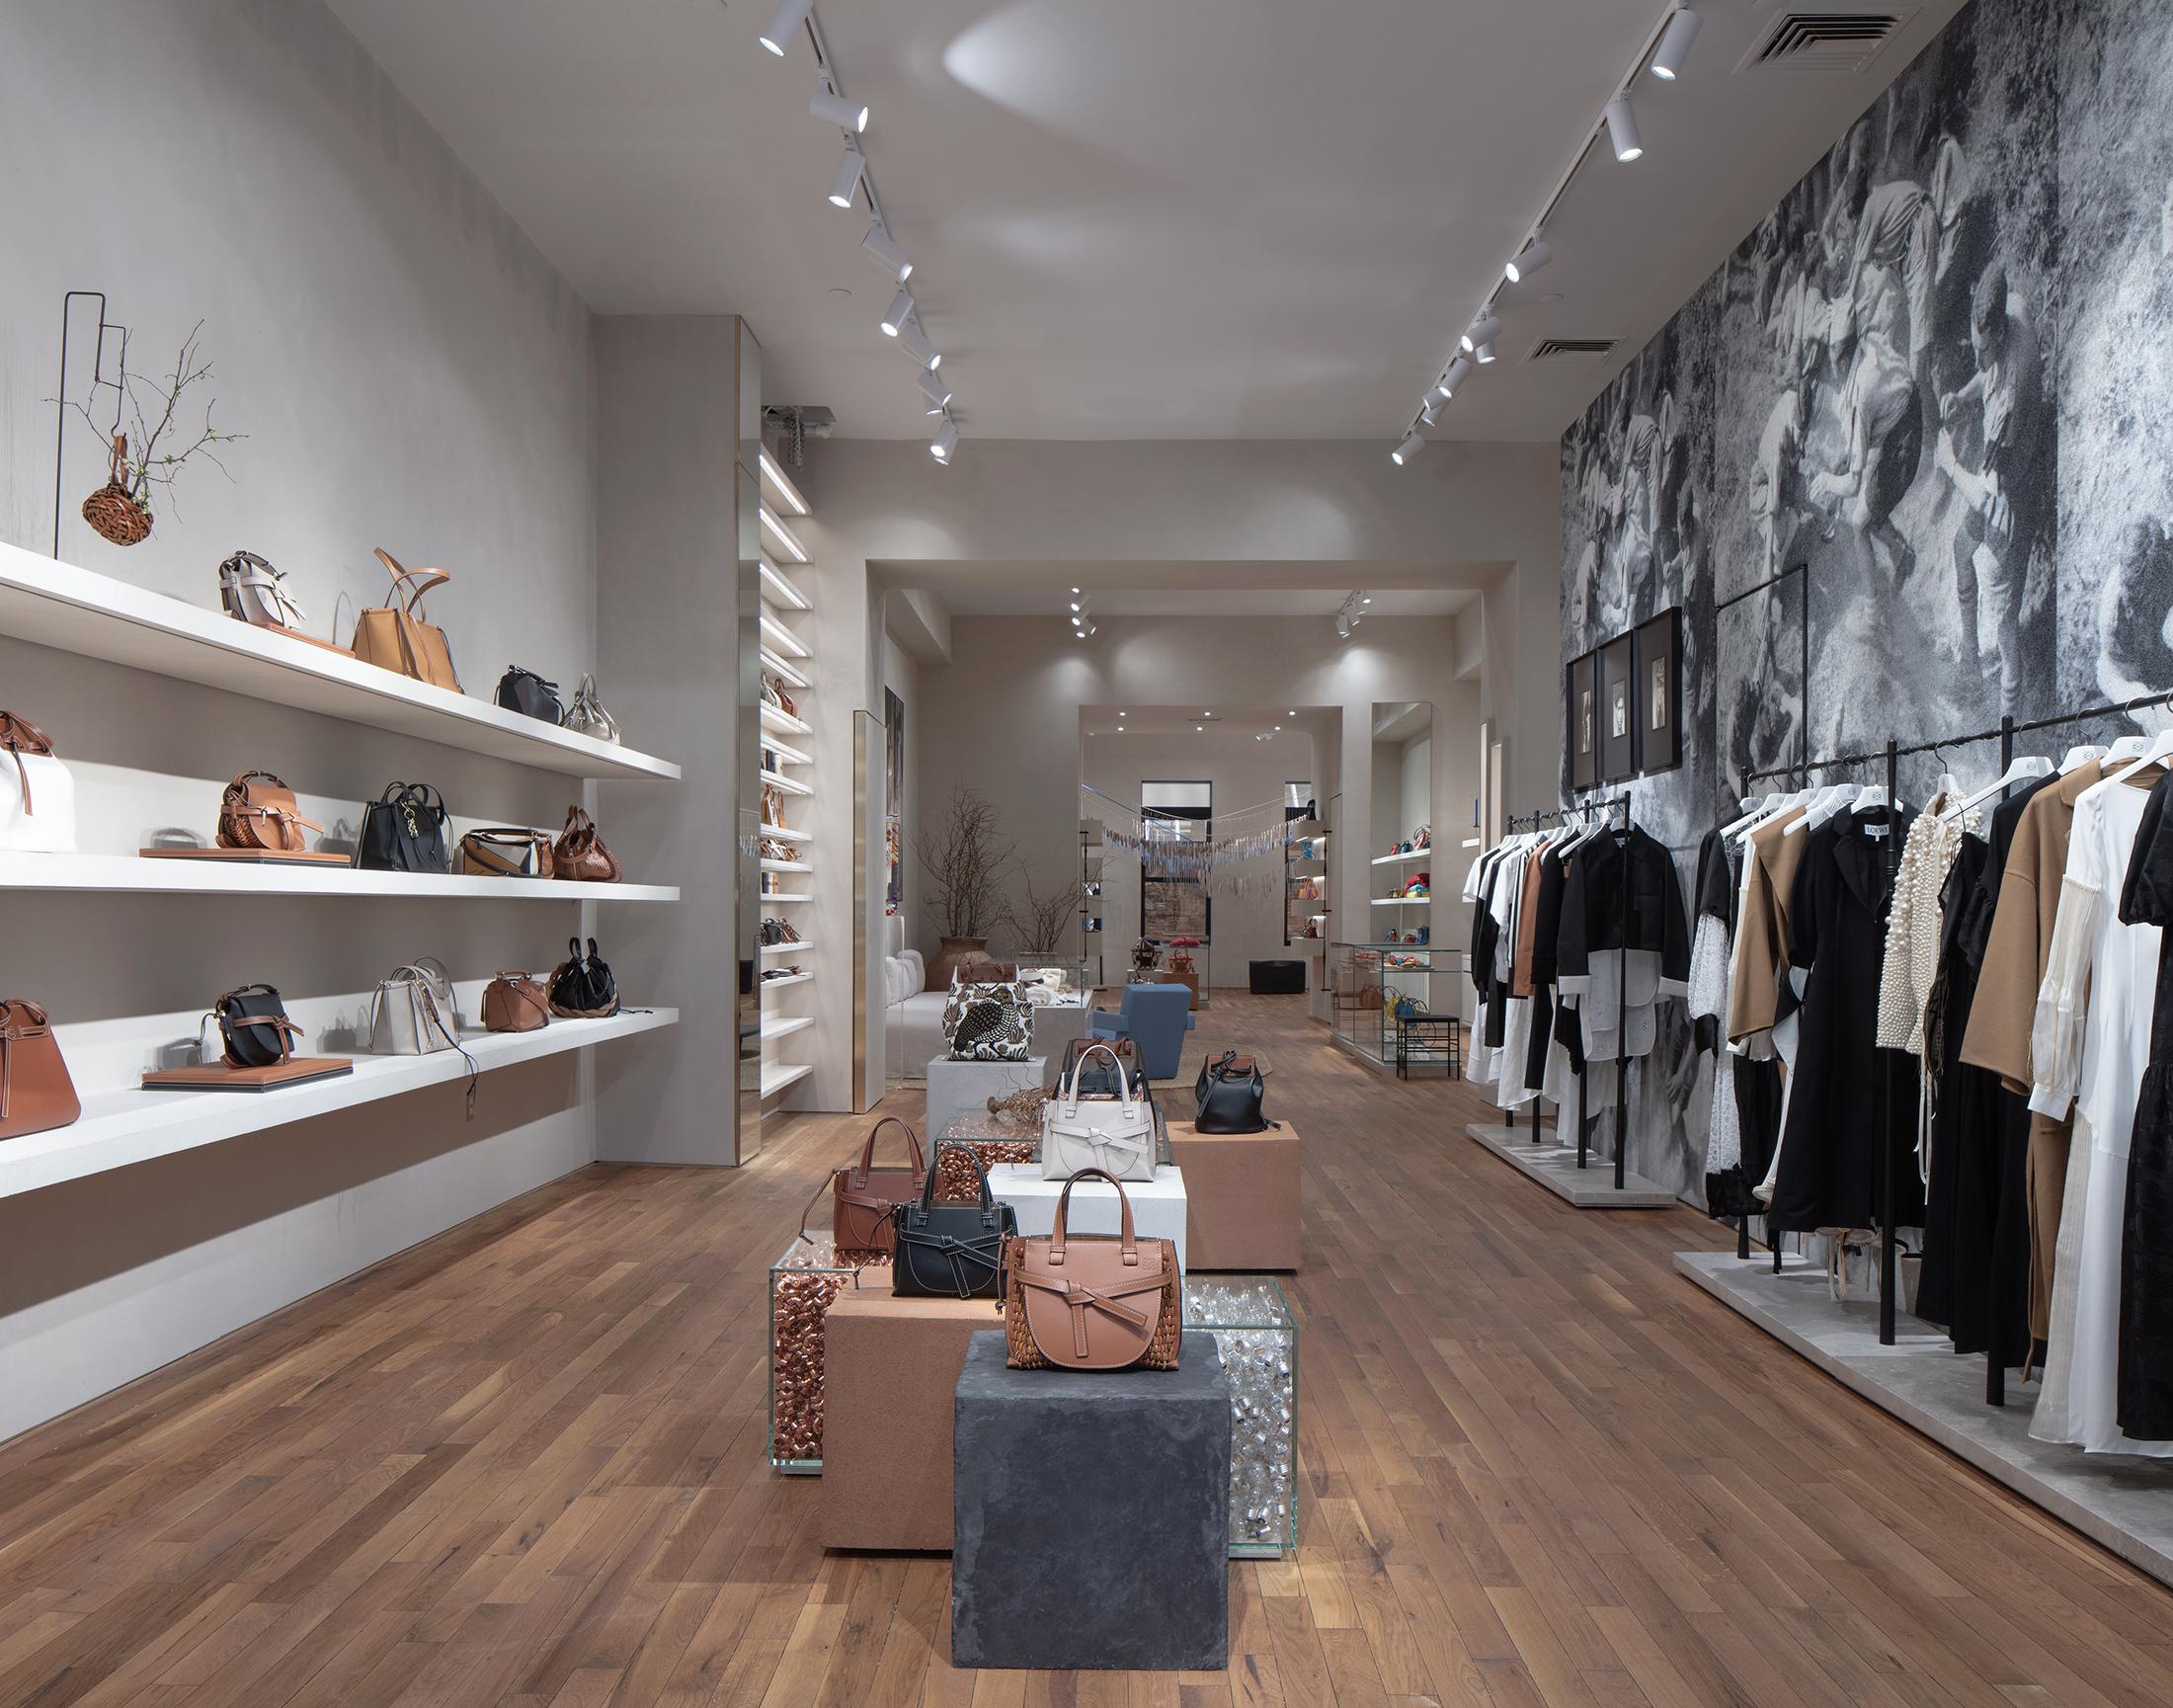 Loewe Opens New Store in SOHO on Greene Street Photos